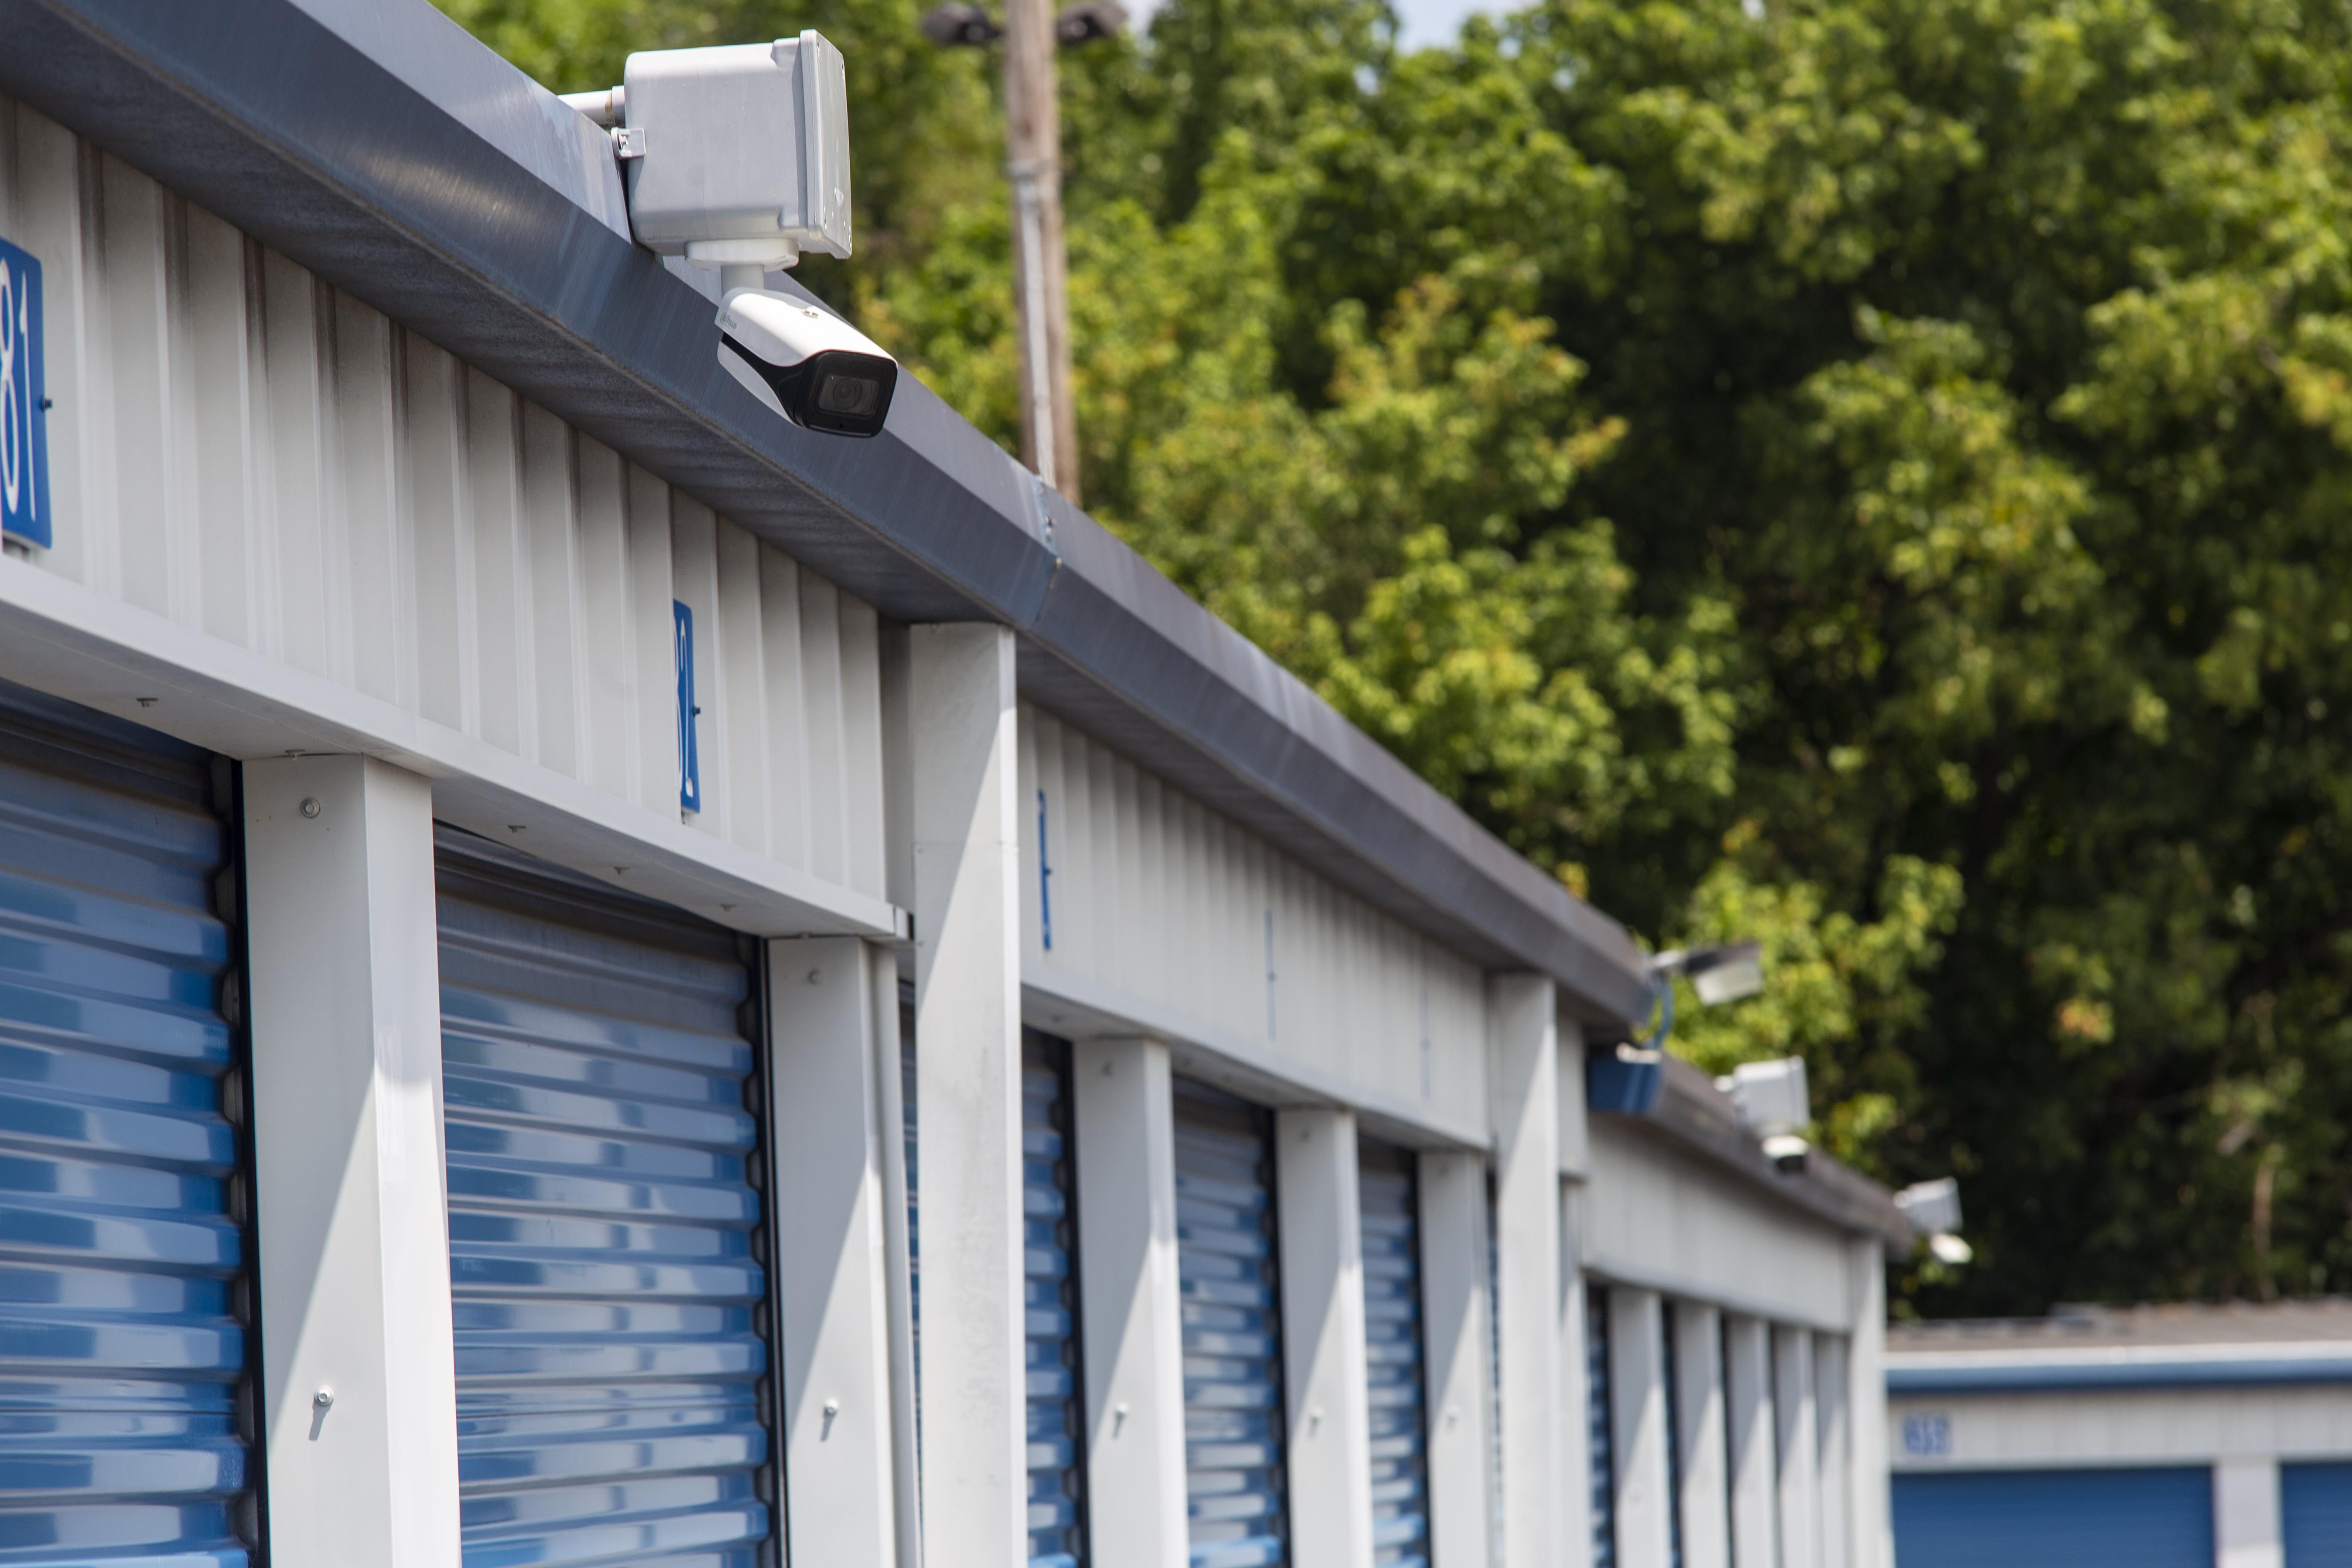 Security cameras provide secure storage